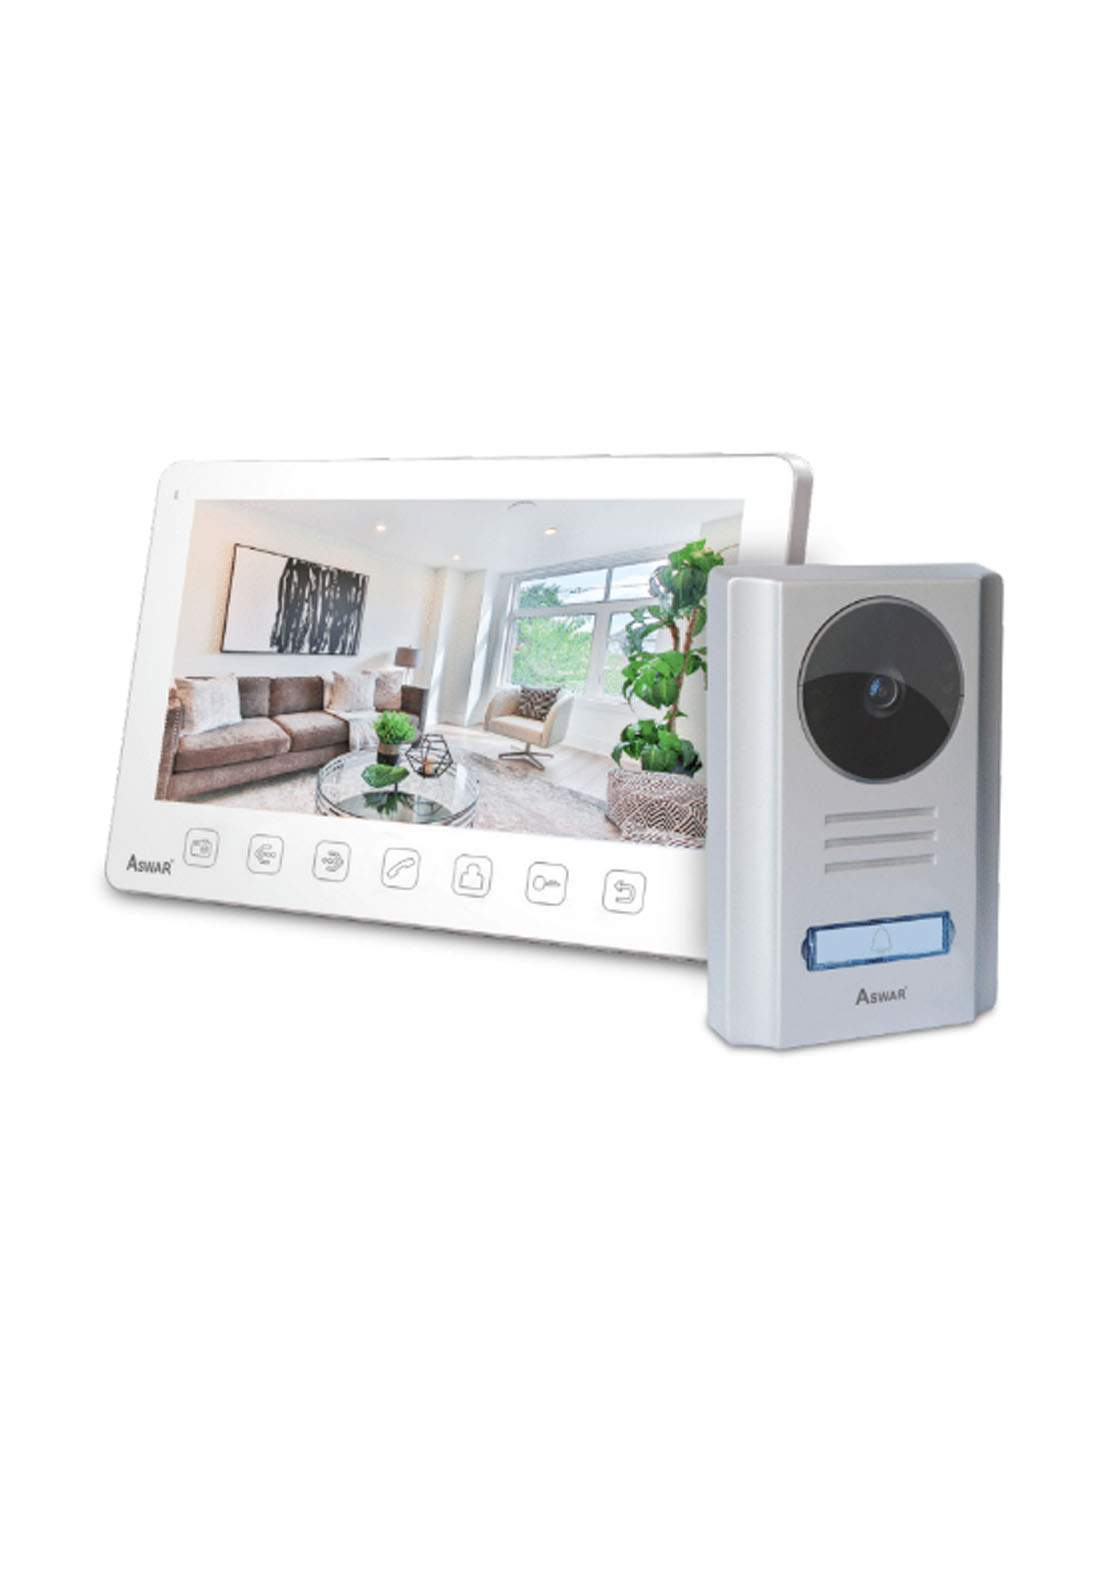 Aswar AS-VDP-40700B Digital LCD Panel Indoor Monitor - Gray كاميرا مراقبة للابواب